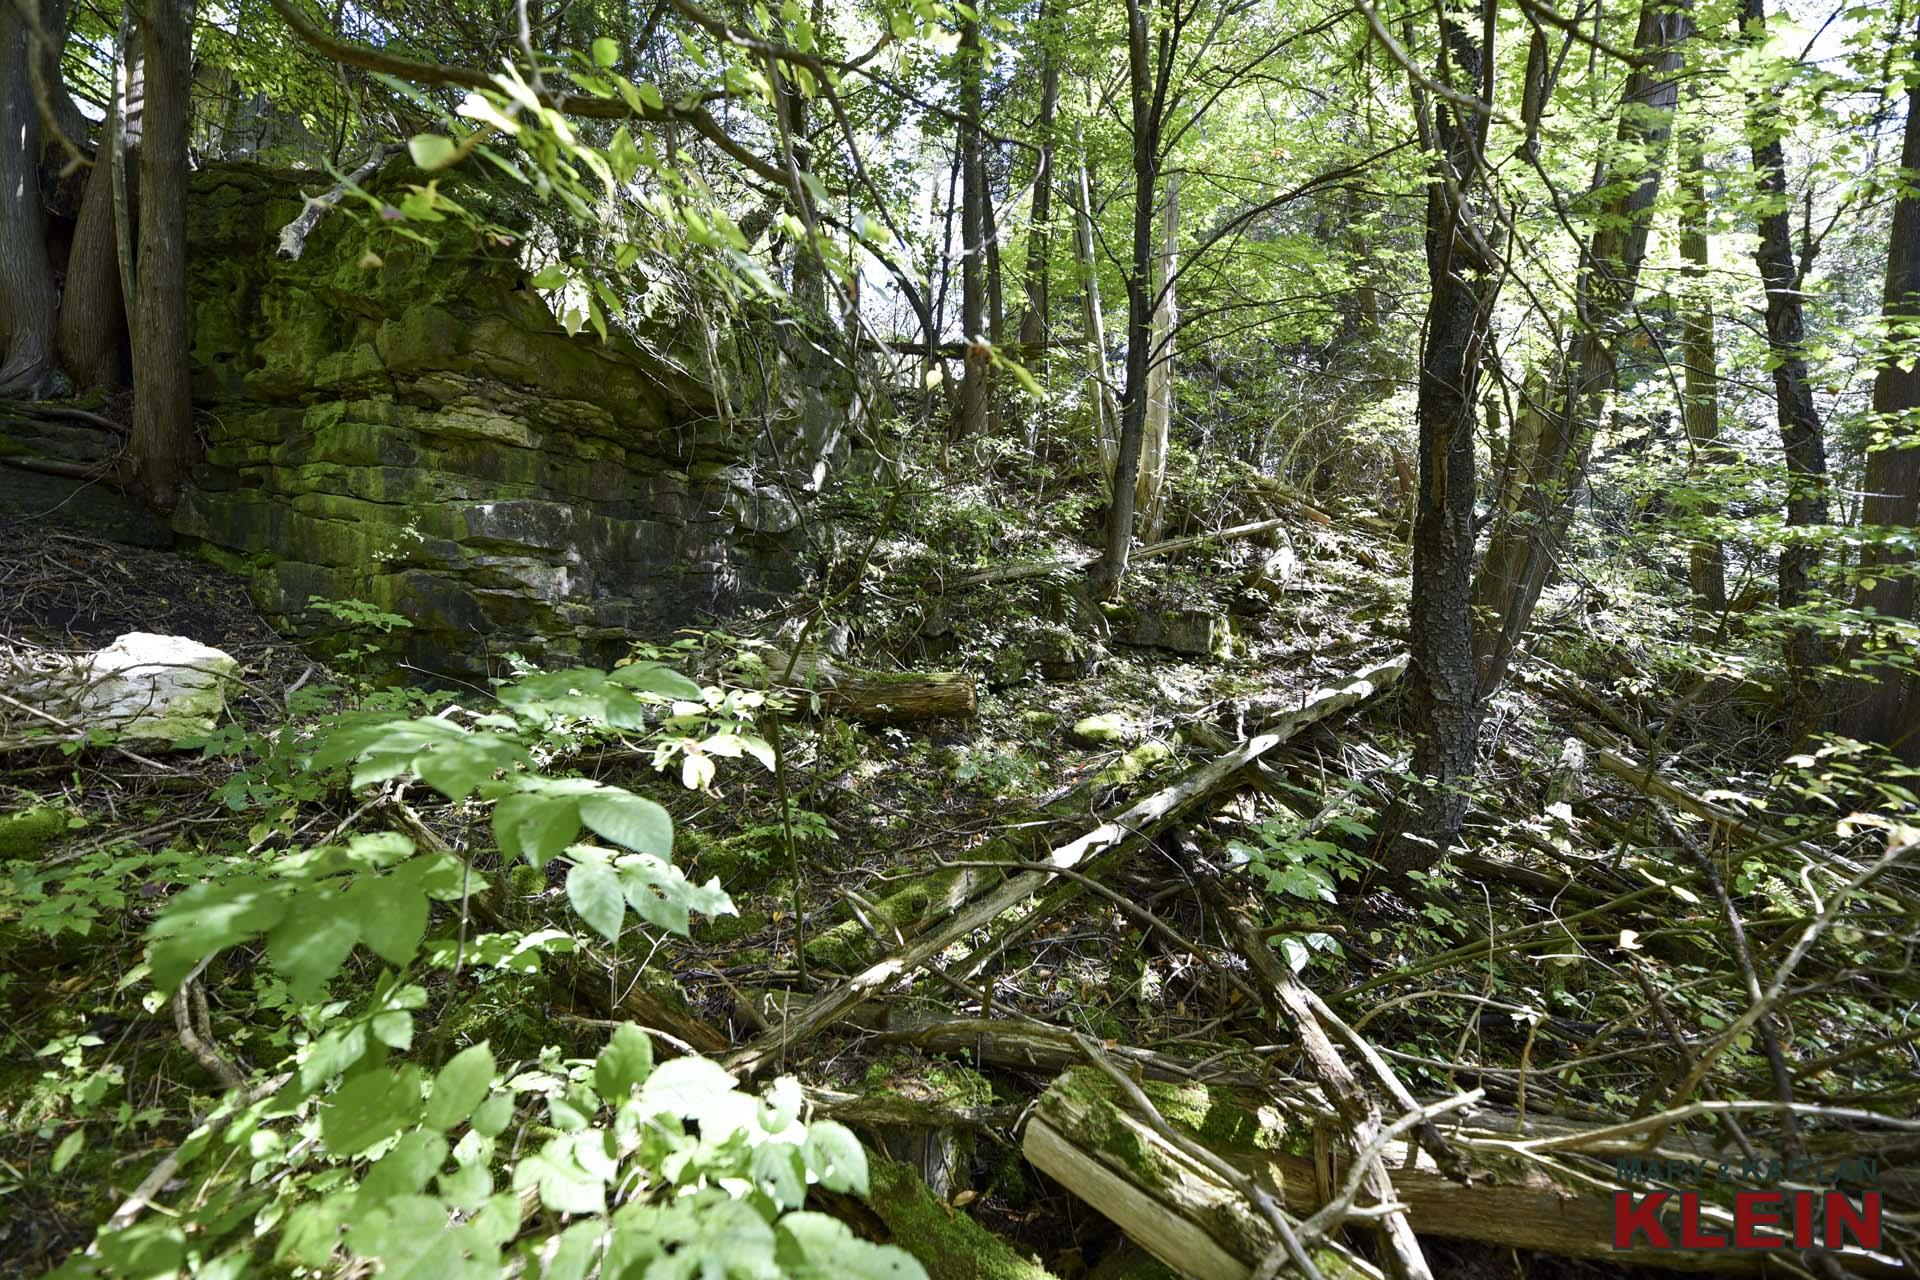 small outcropping of the Niagara Escarpment (dolomite) along its western edge